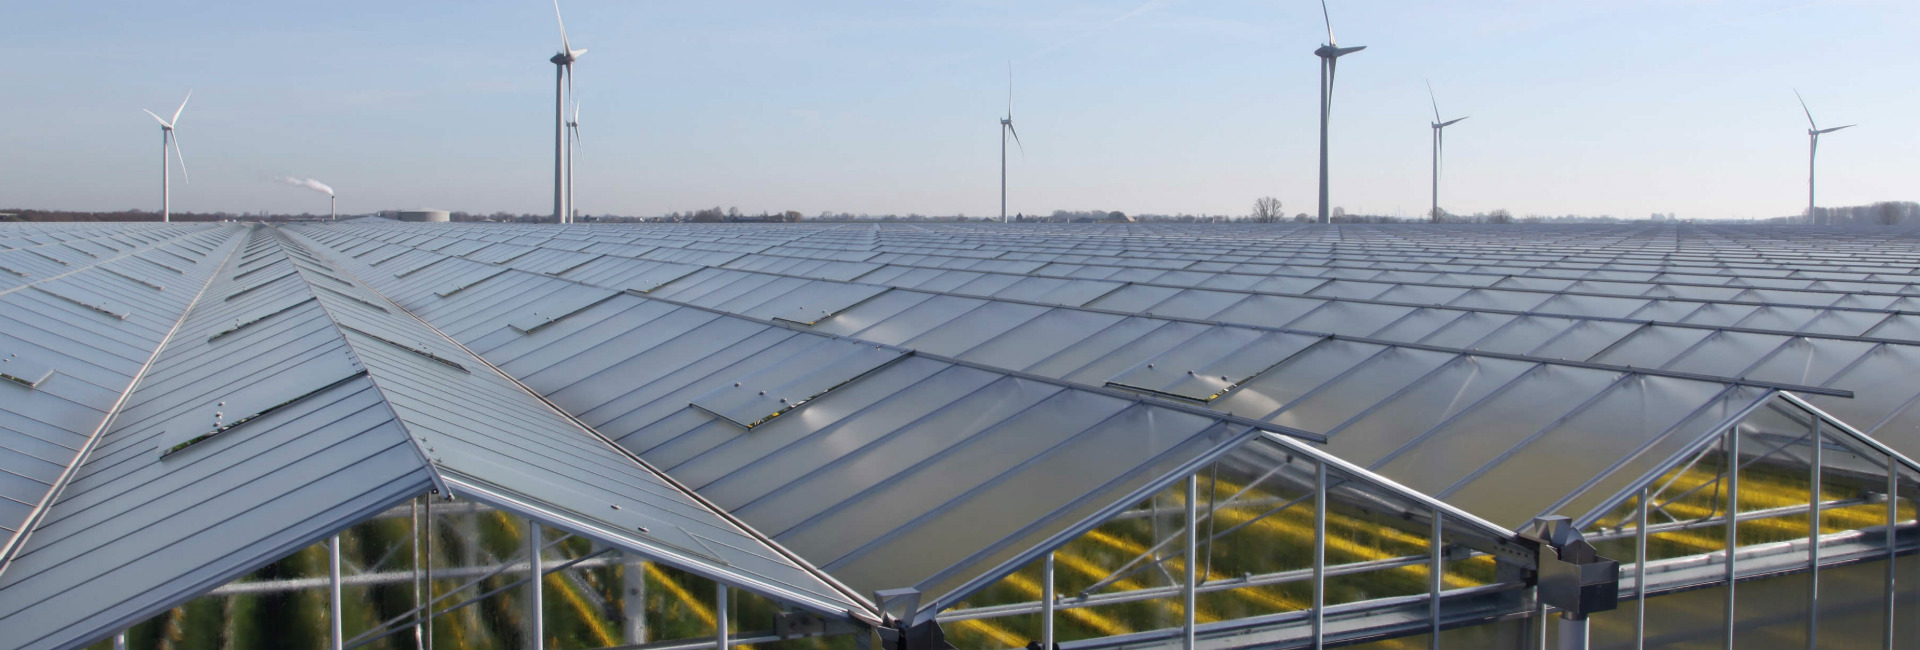 Aluminium greenhouse roof systems